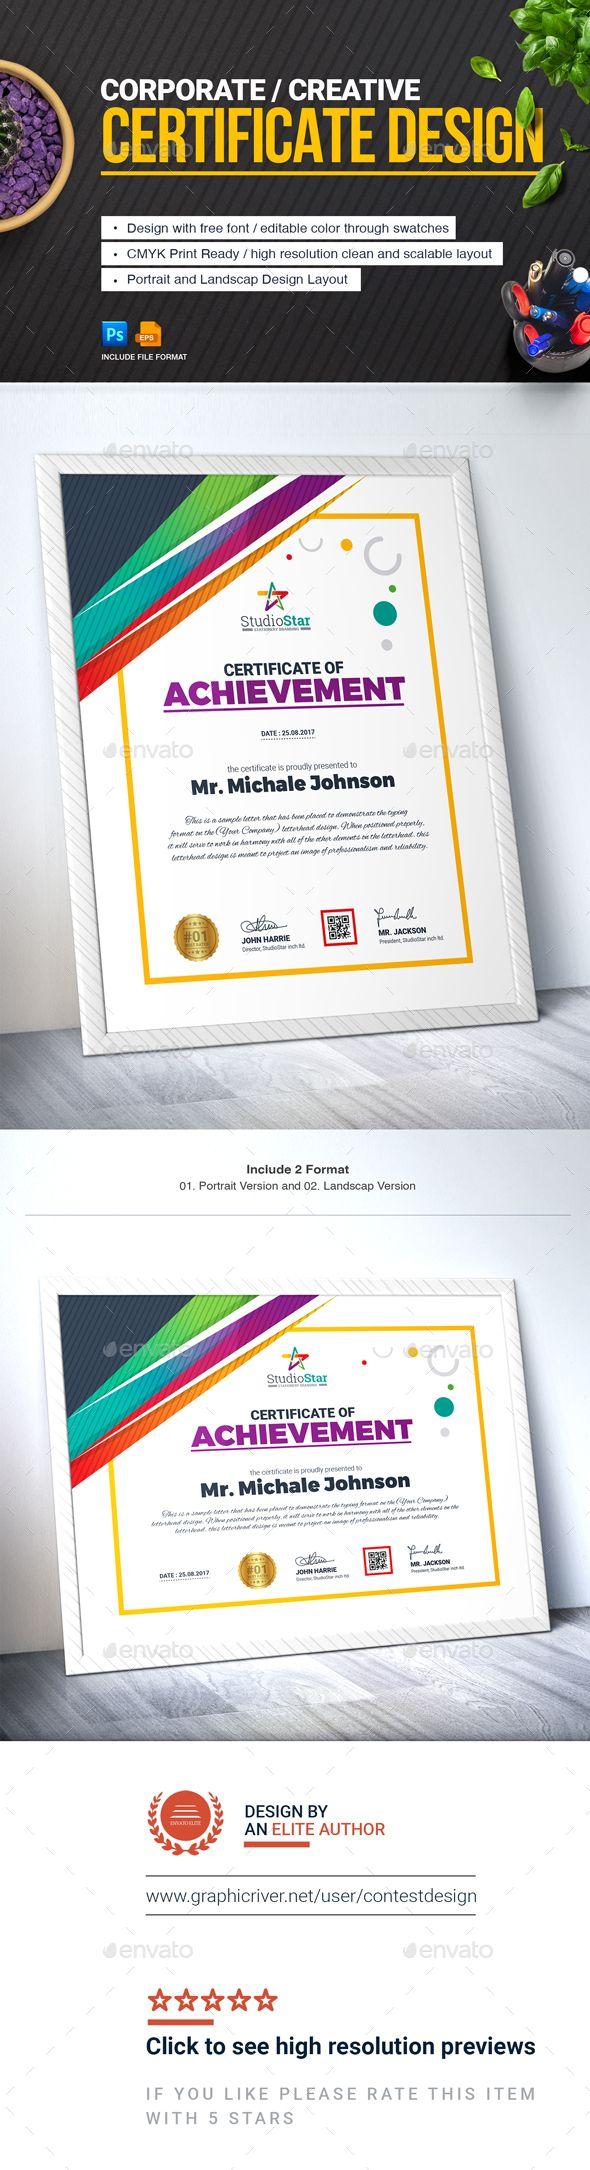 Certificate #Design Template | #Certificate of Achievement - Certificates Stationery